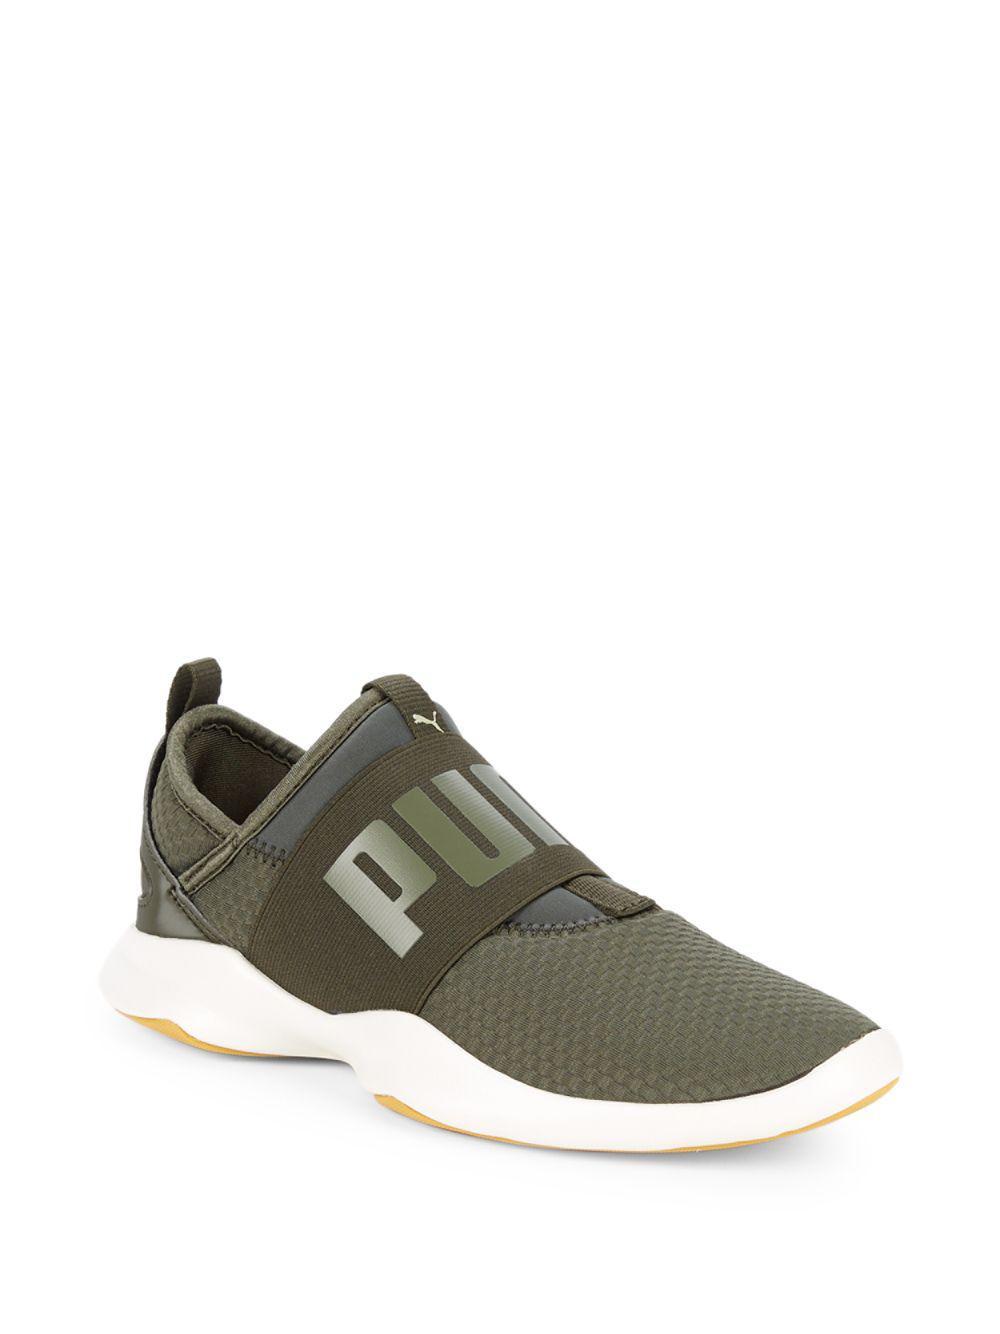 fd7b78215a3 Lyst - PUMA Dare Logo Slip-on Sneakers in Green for Men